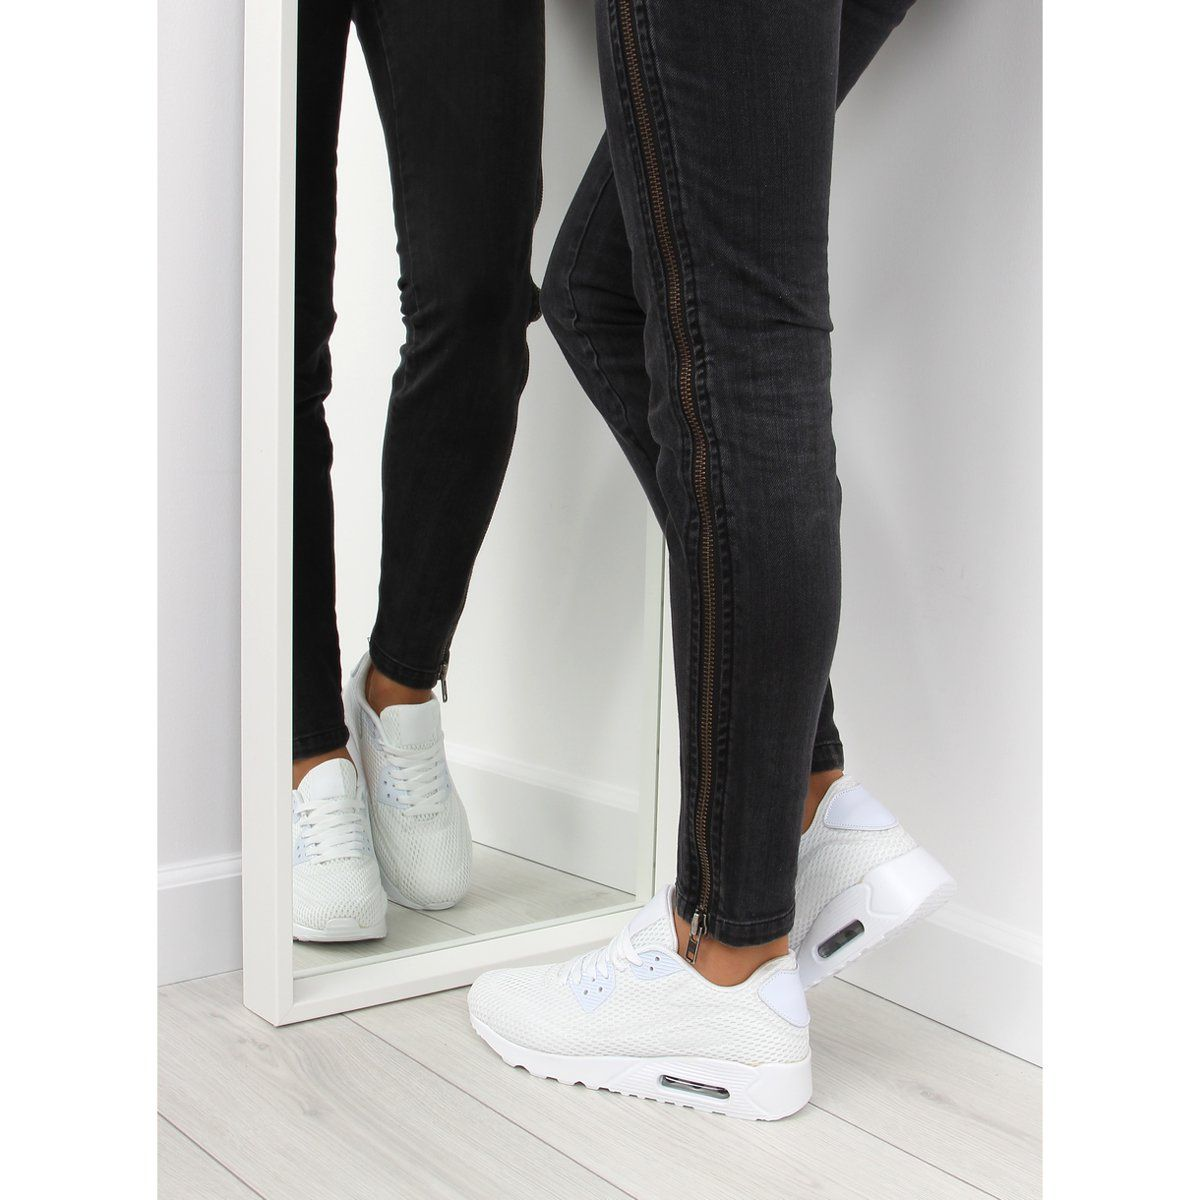 Buty Sportowe Damskie Biale Dsc33 White Fashion Black Jeans Black